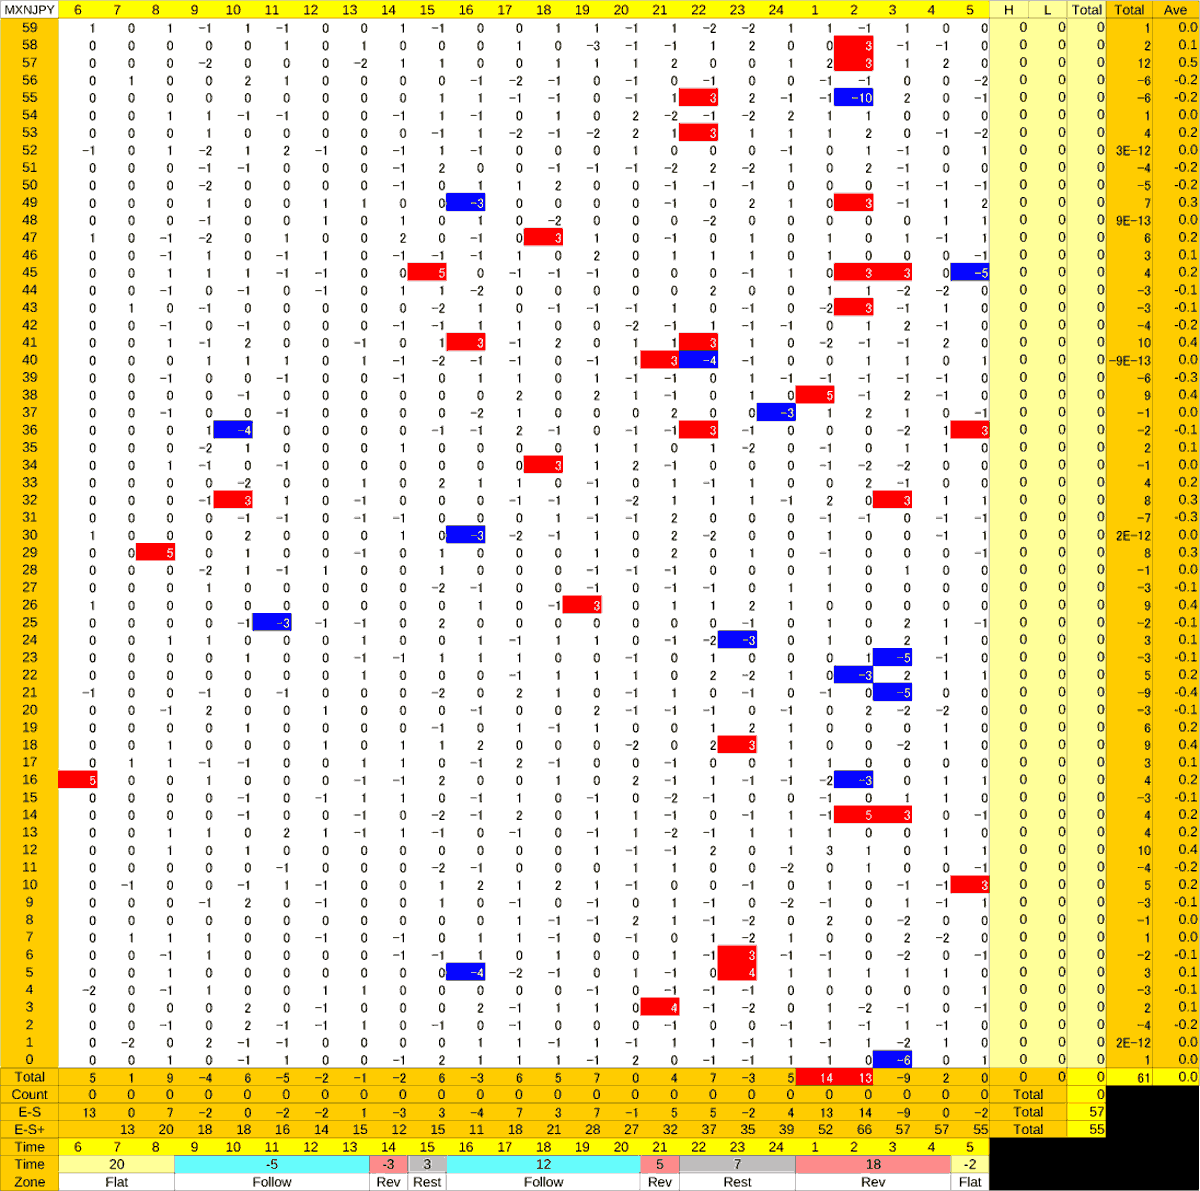 20200813_HS(3)MXNJPY